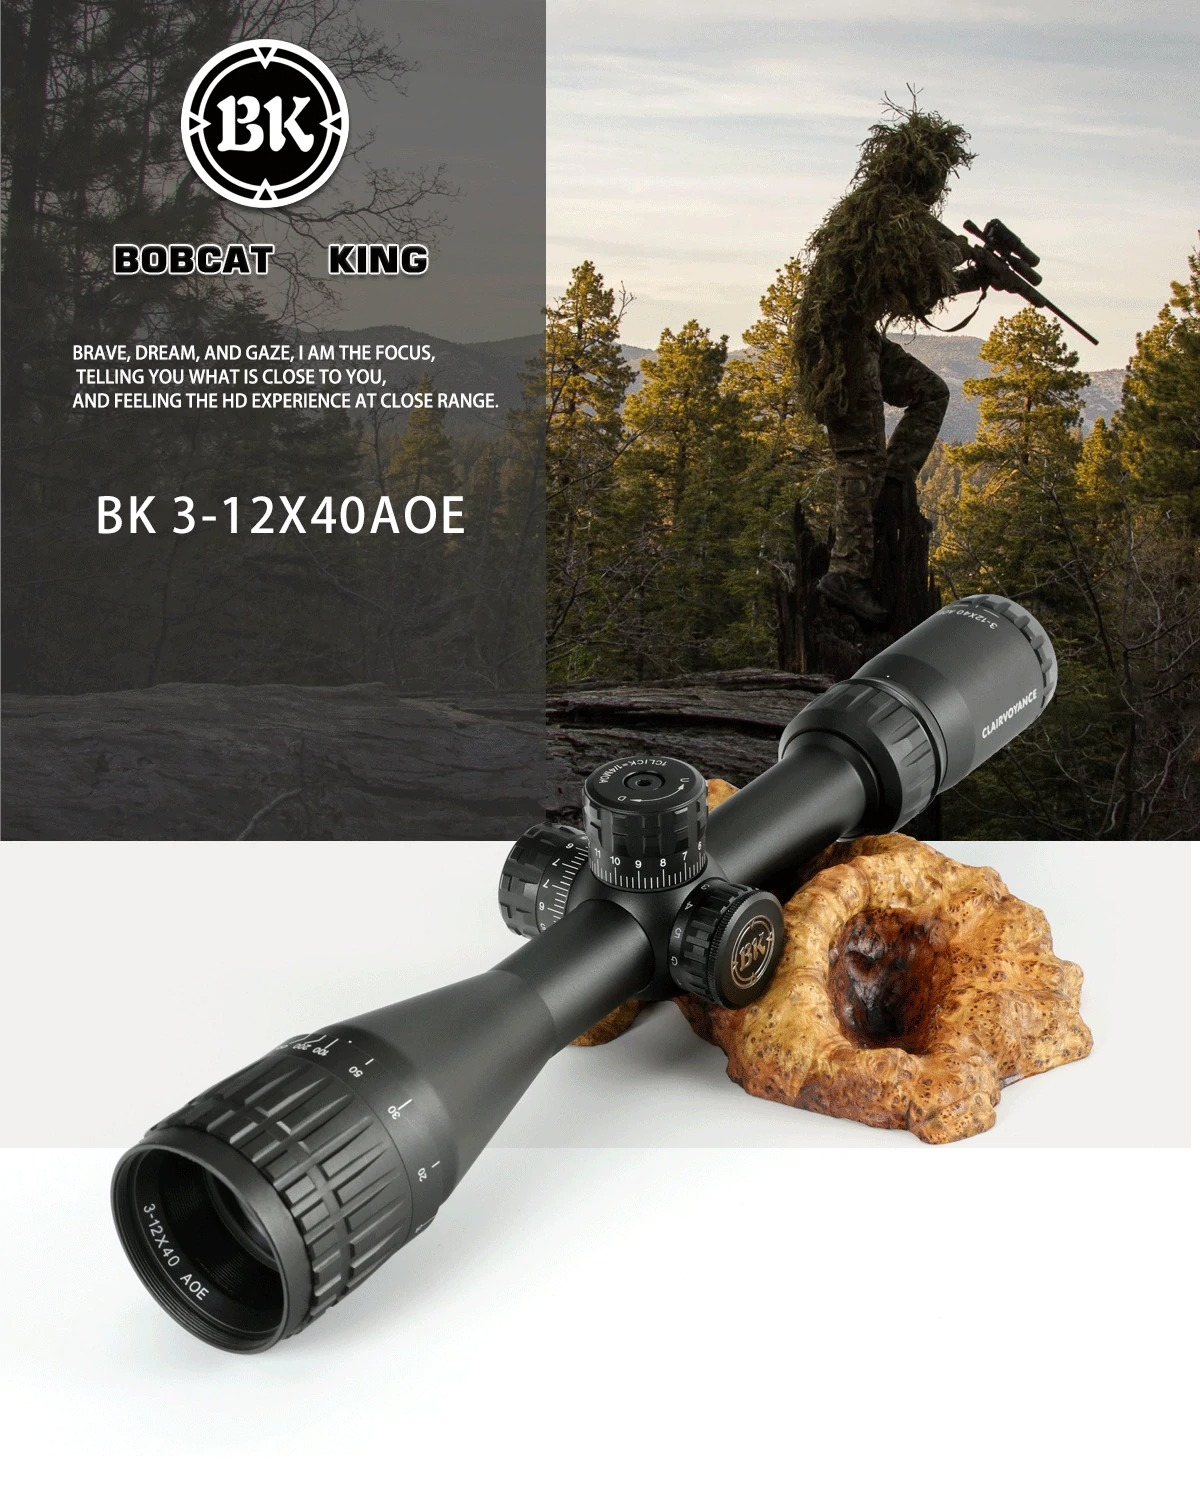 Bobcat King 3-12X40 AOE Riflescope Airsoft Hunting Rifle Scope 1